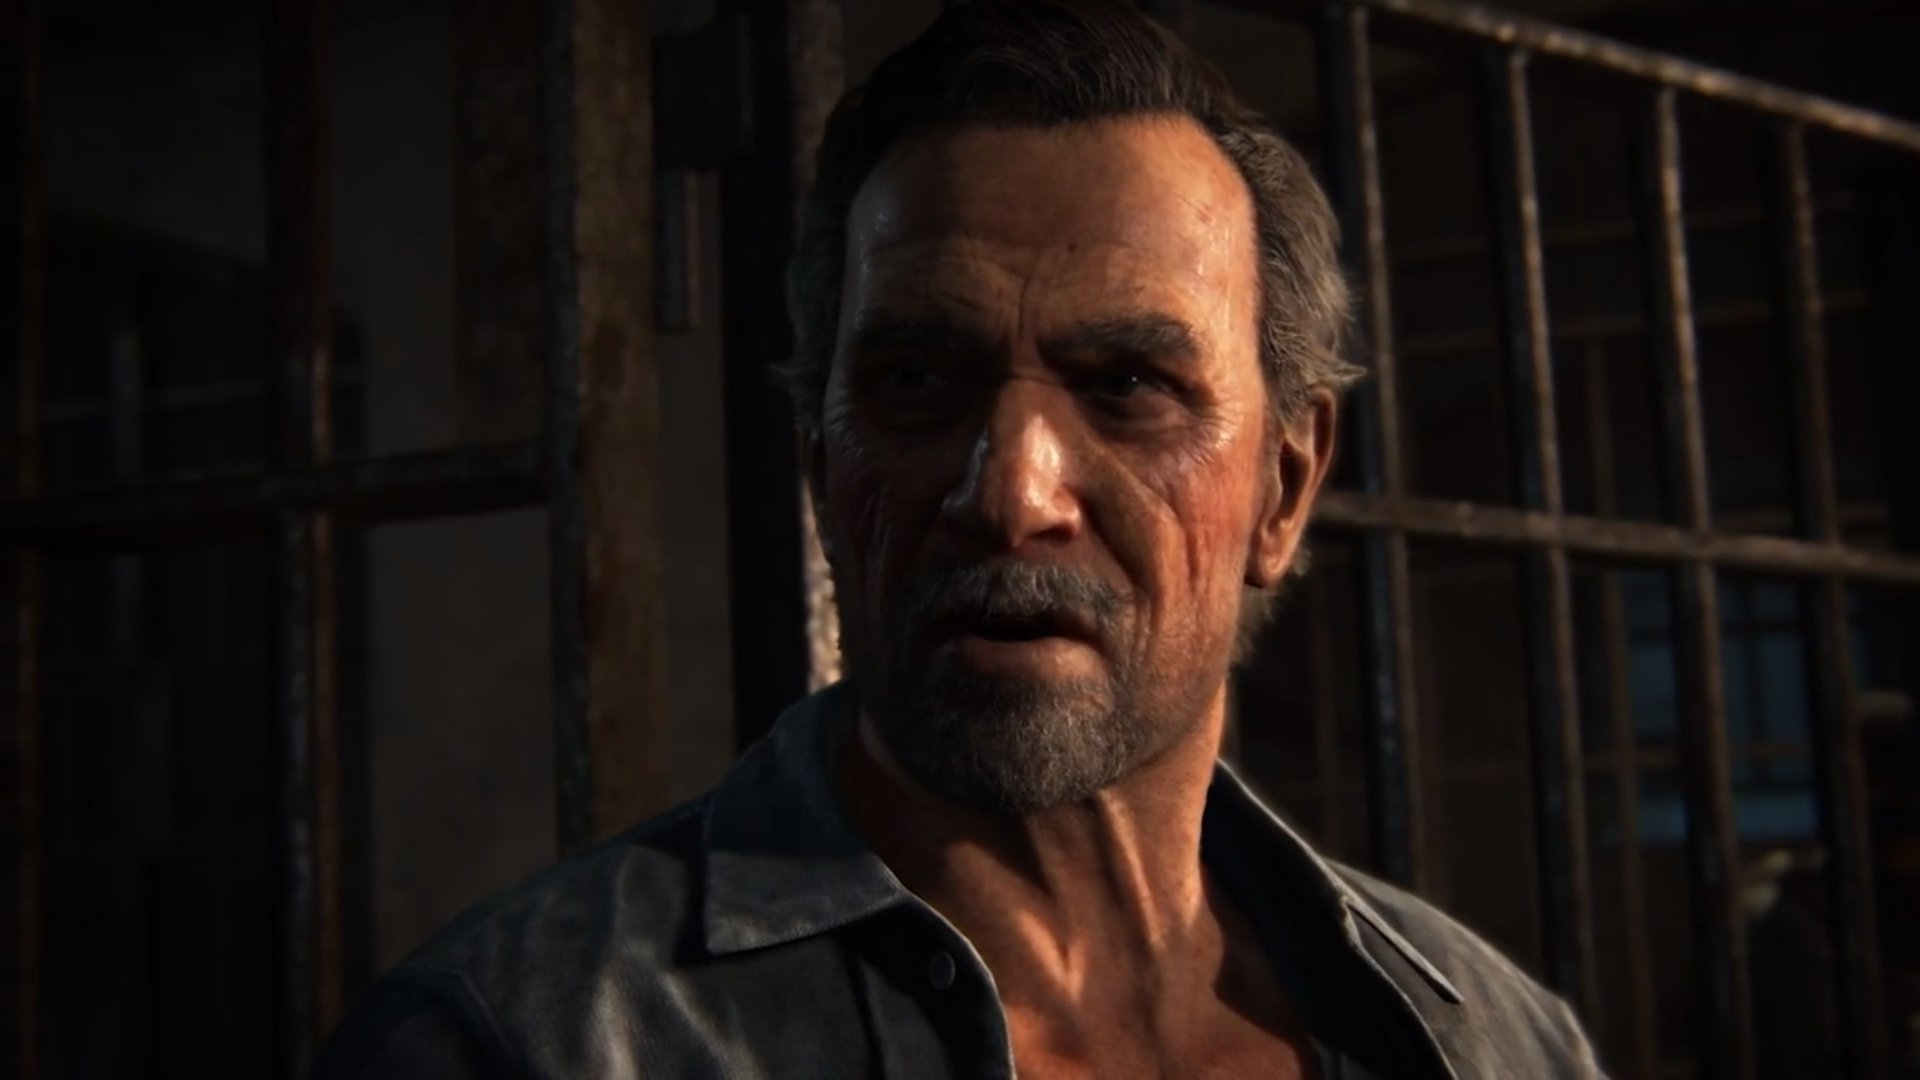 PlayStation Showcase: Uncharted 4: A Thief's End and Lost Legacy llegará a PlayStation 5 y PC 4